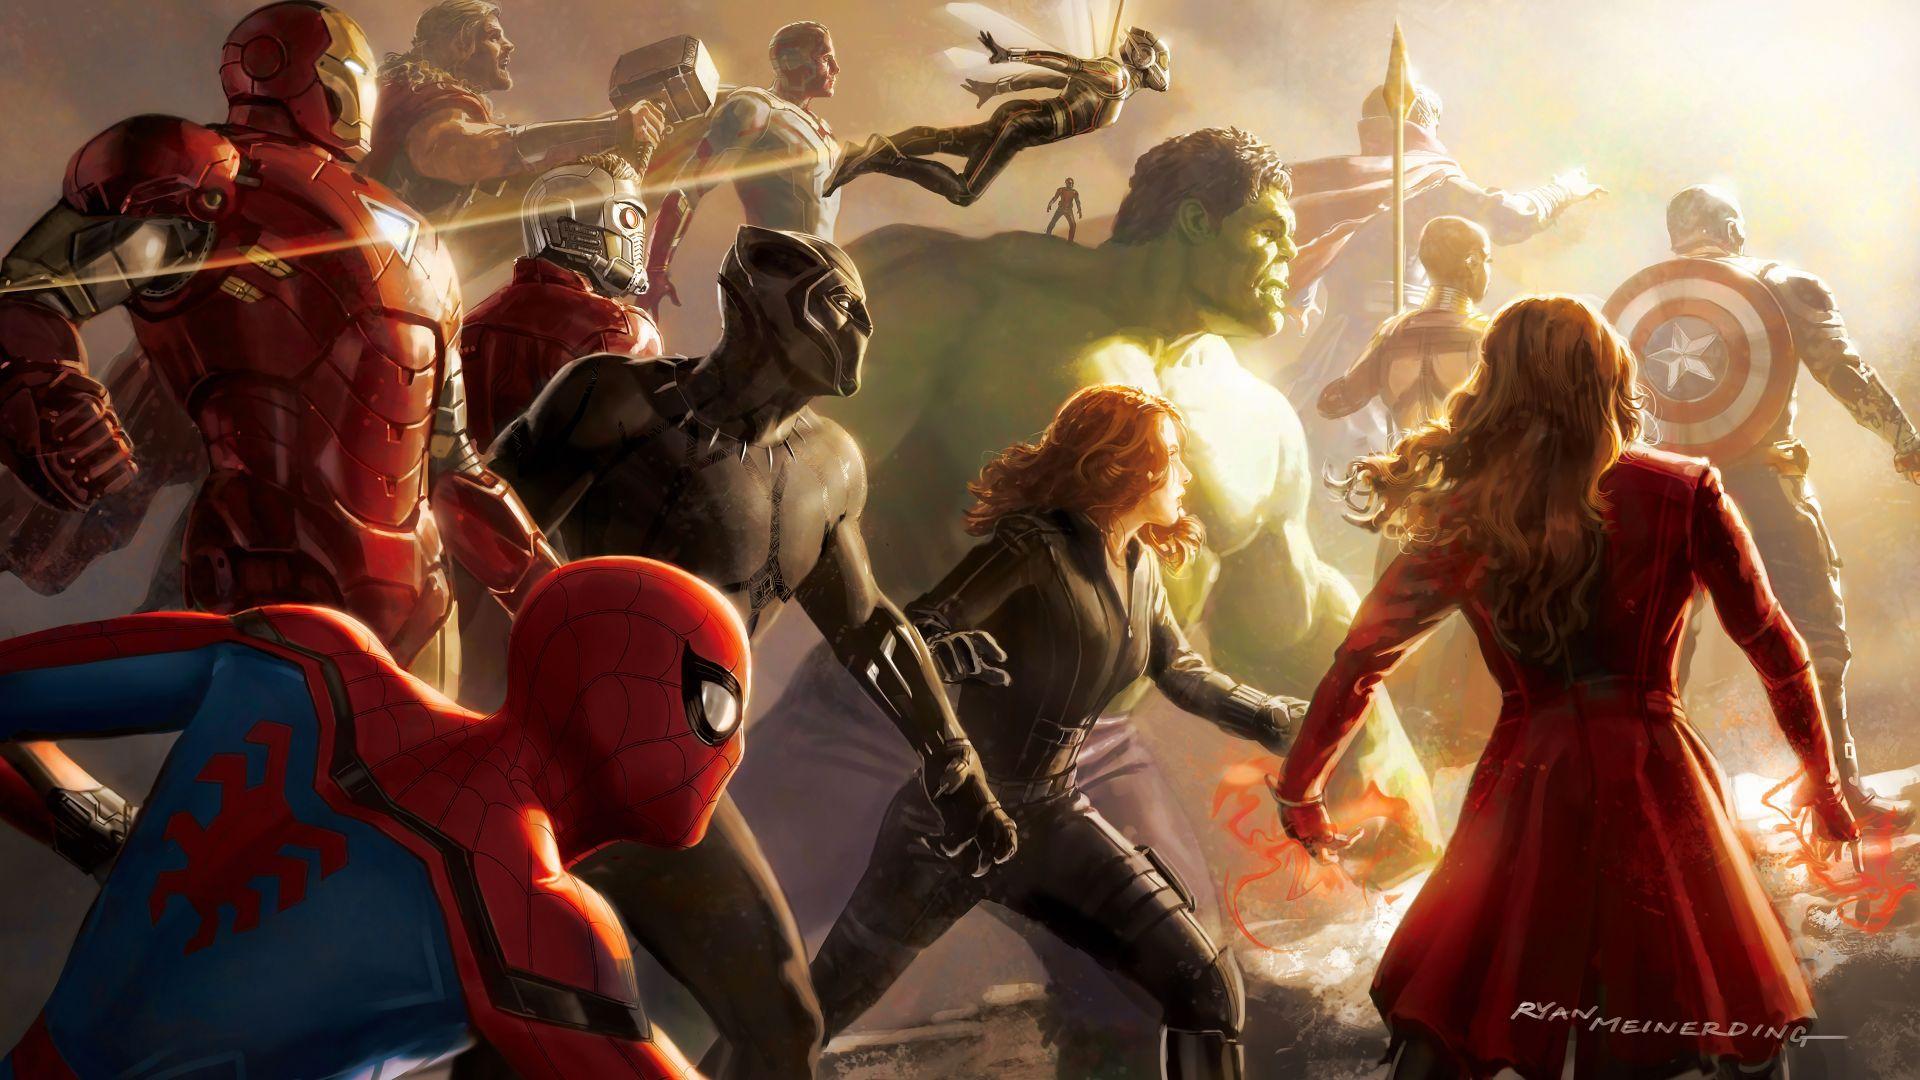 Download Wallpapers Of Avengers Infinity War Artwork Marvel